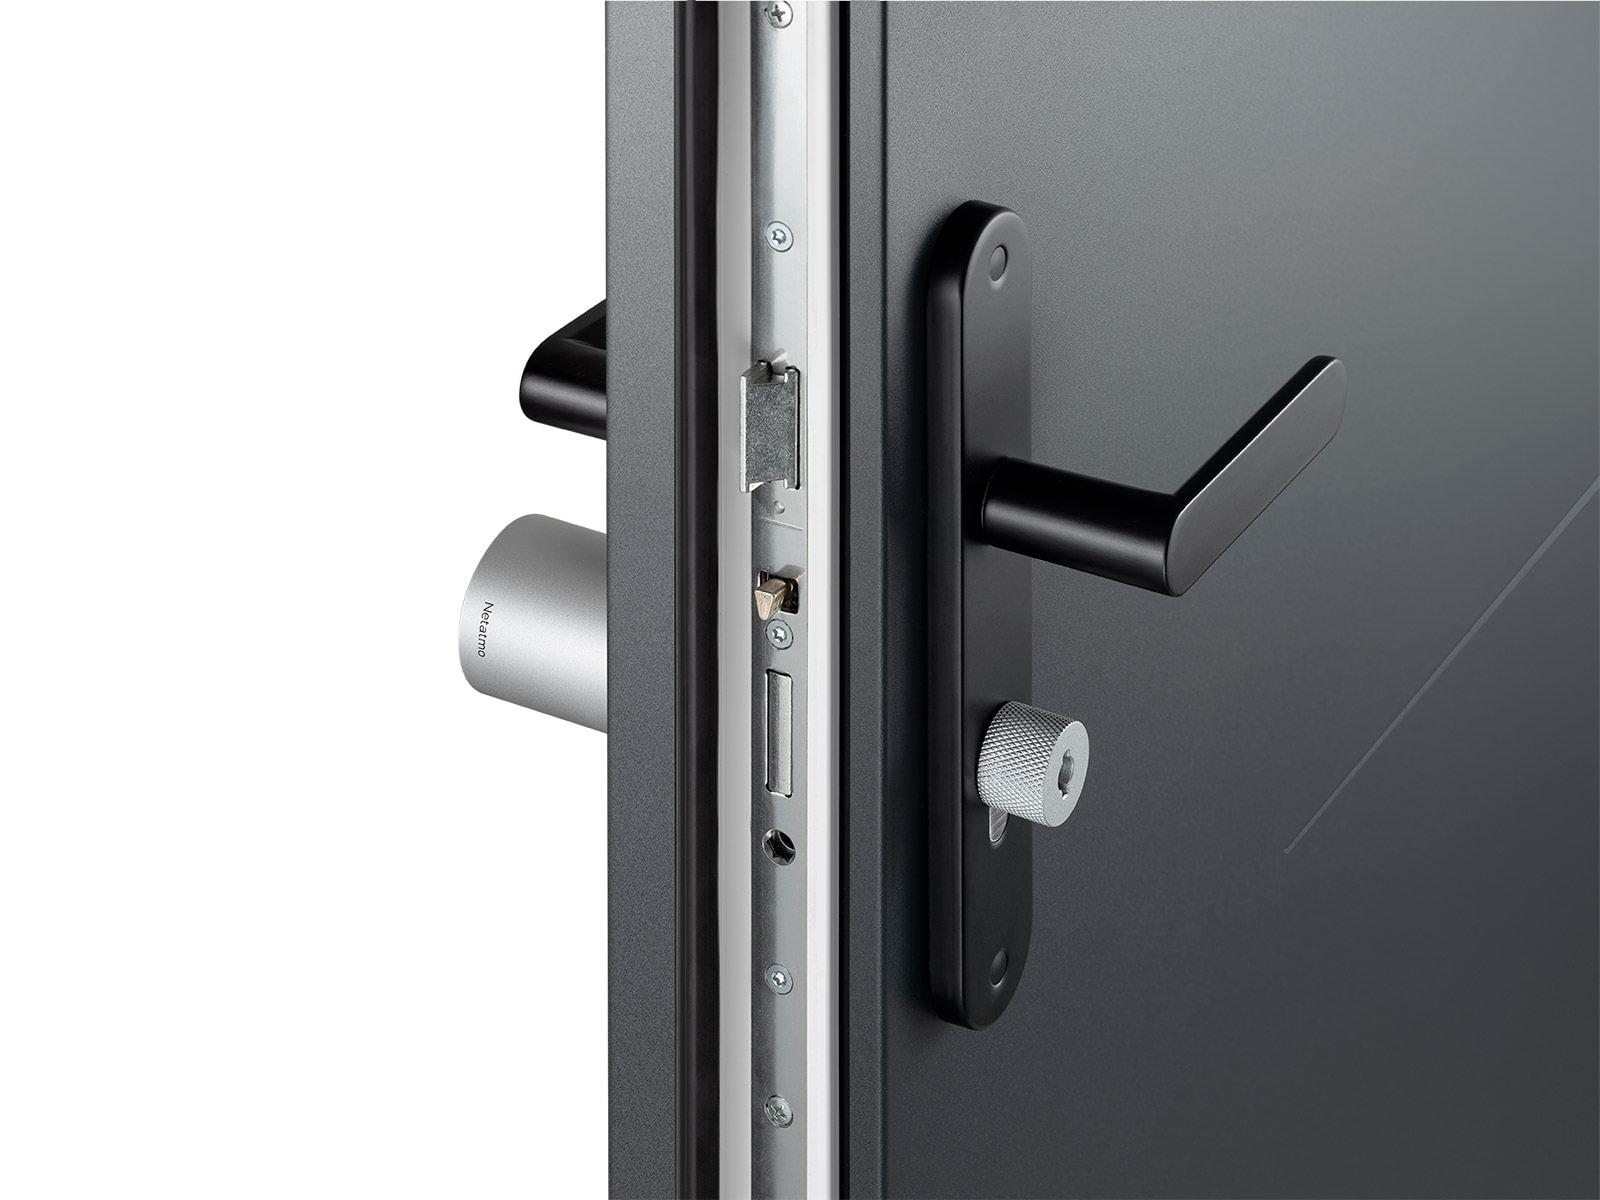 netatmo serratura smart